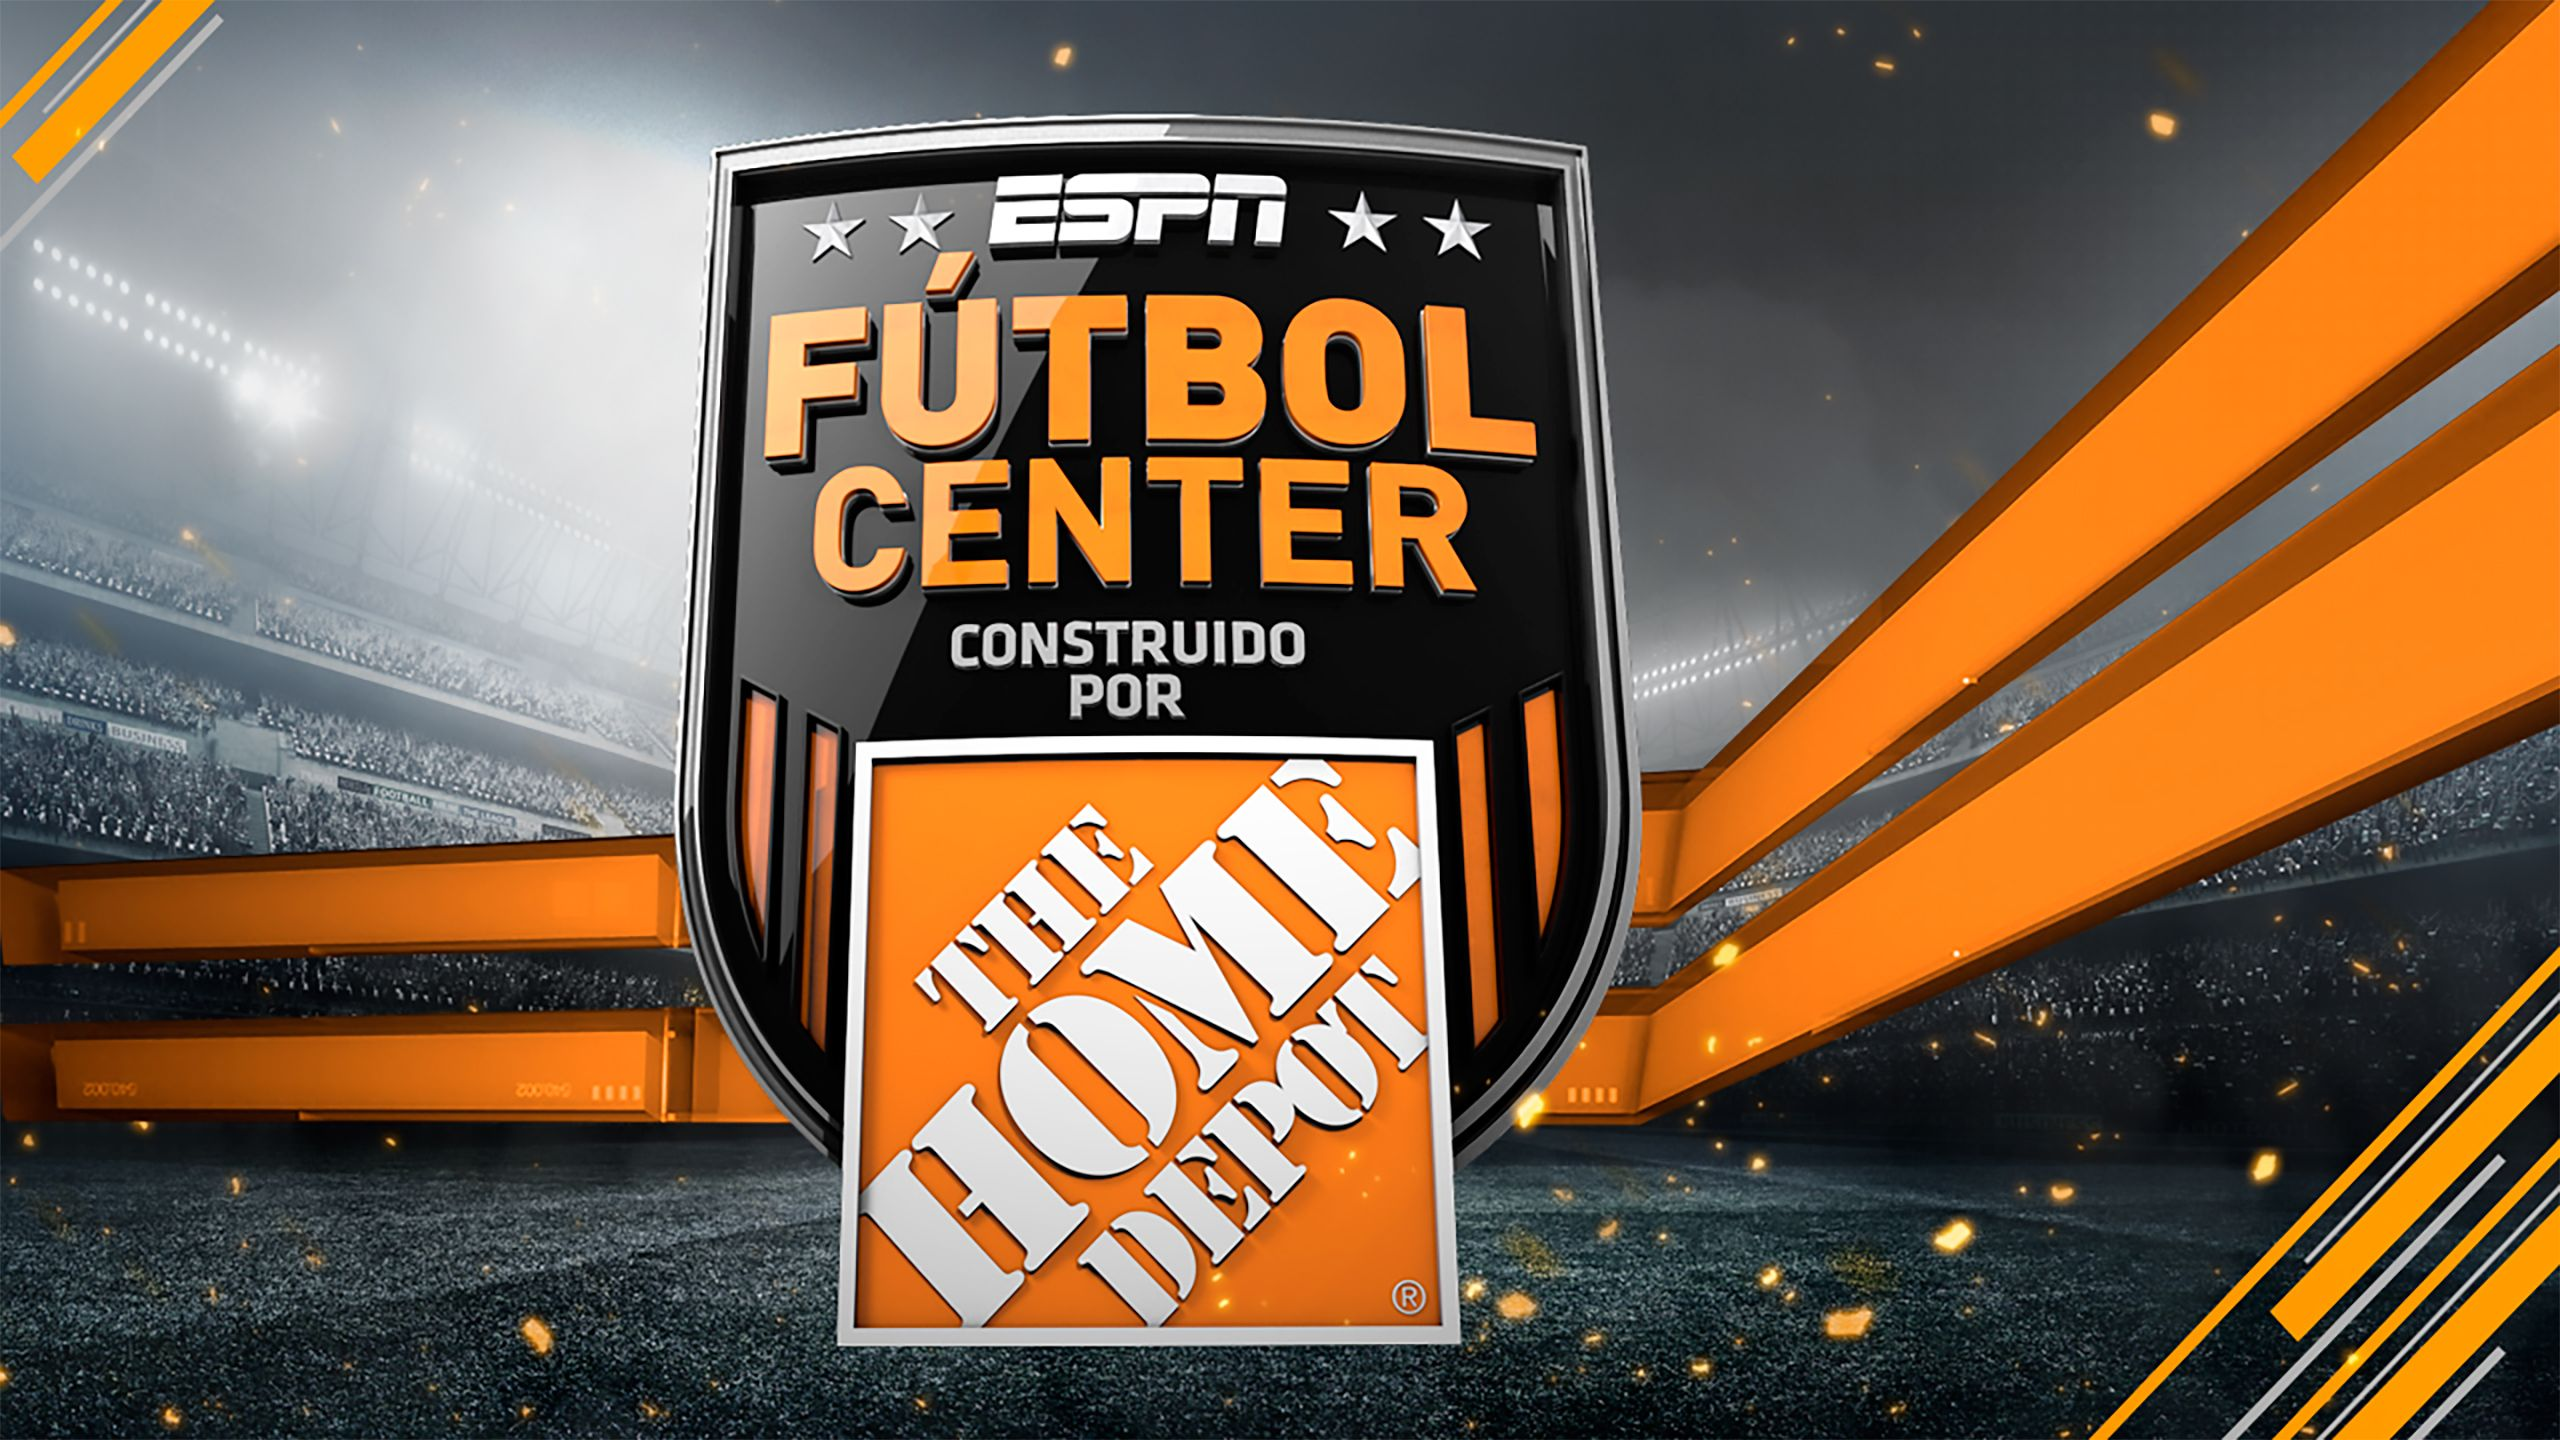 ESPN Fútbol Center: Presentado por Home Depot